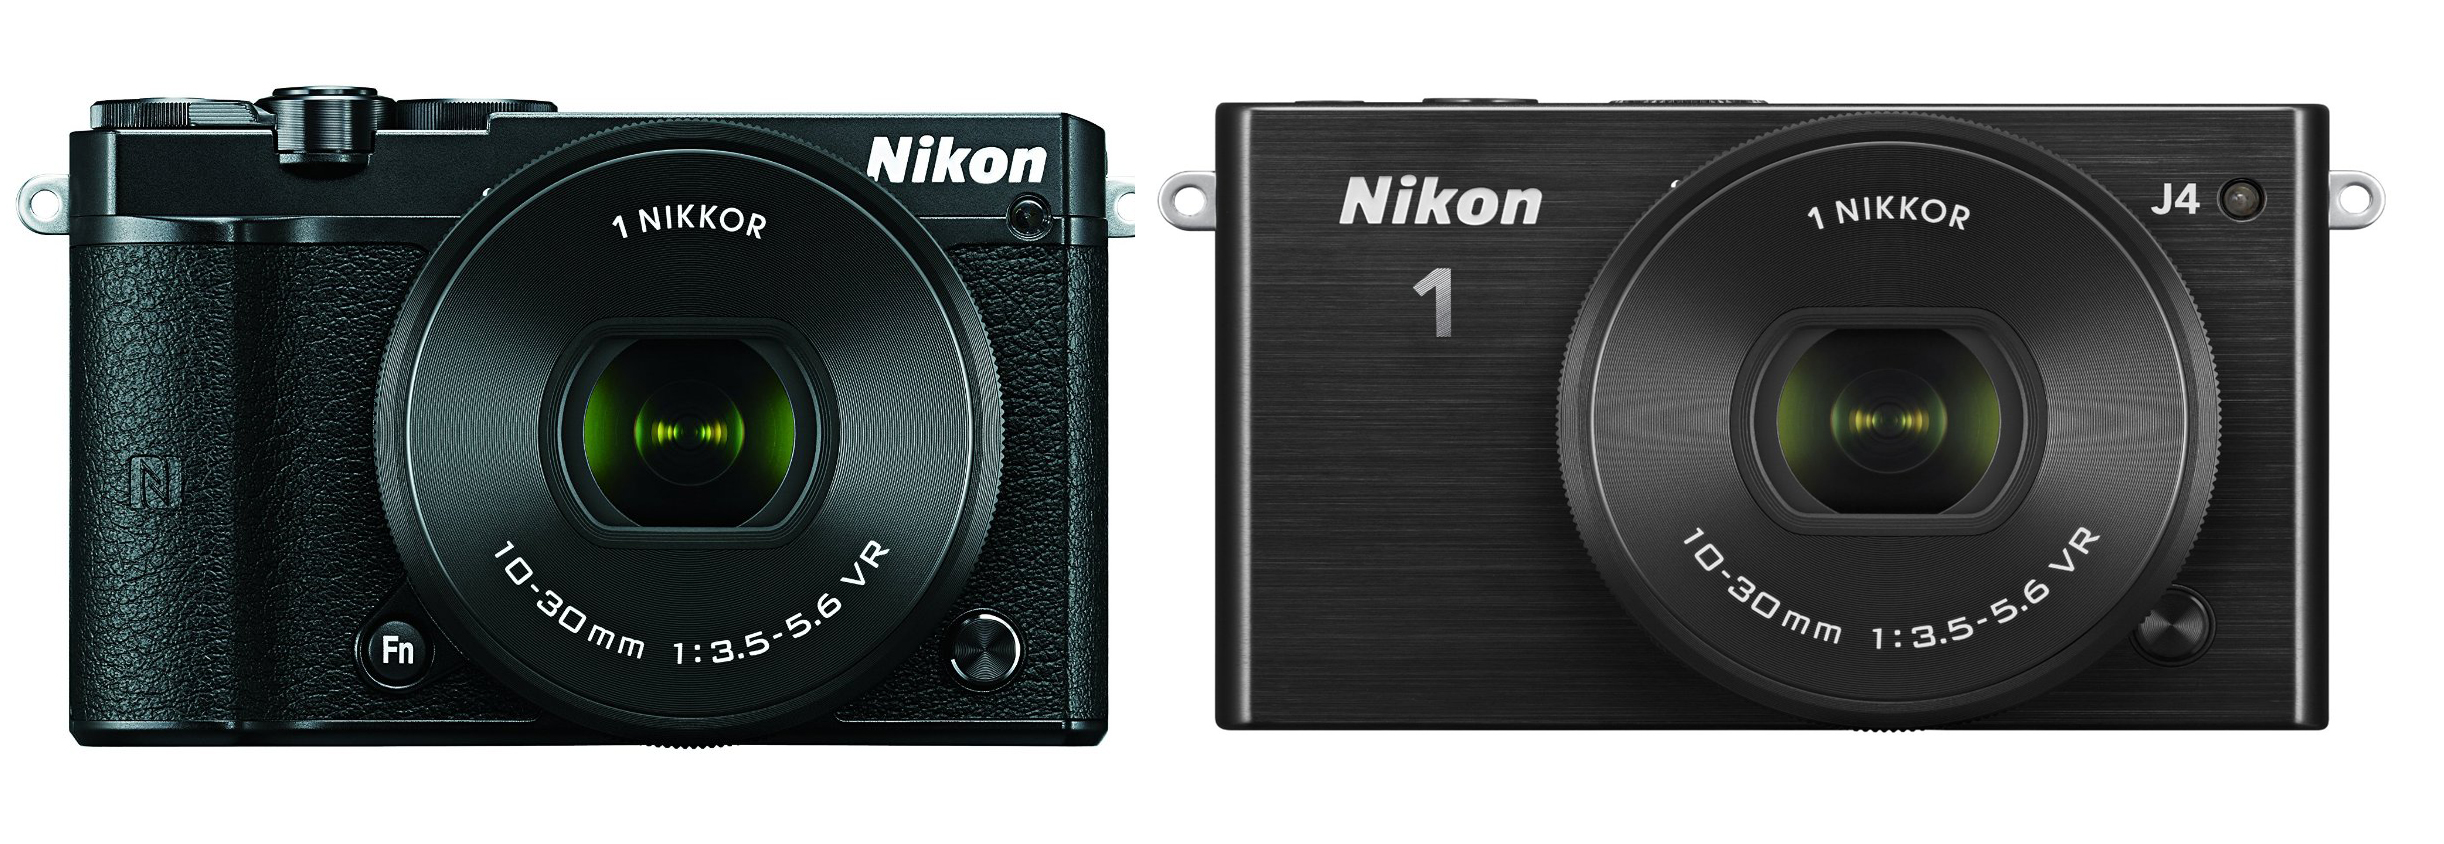 Nikon-1-J5-VS-J4